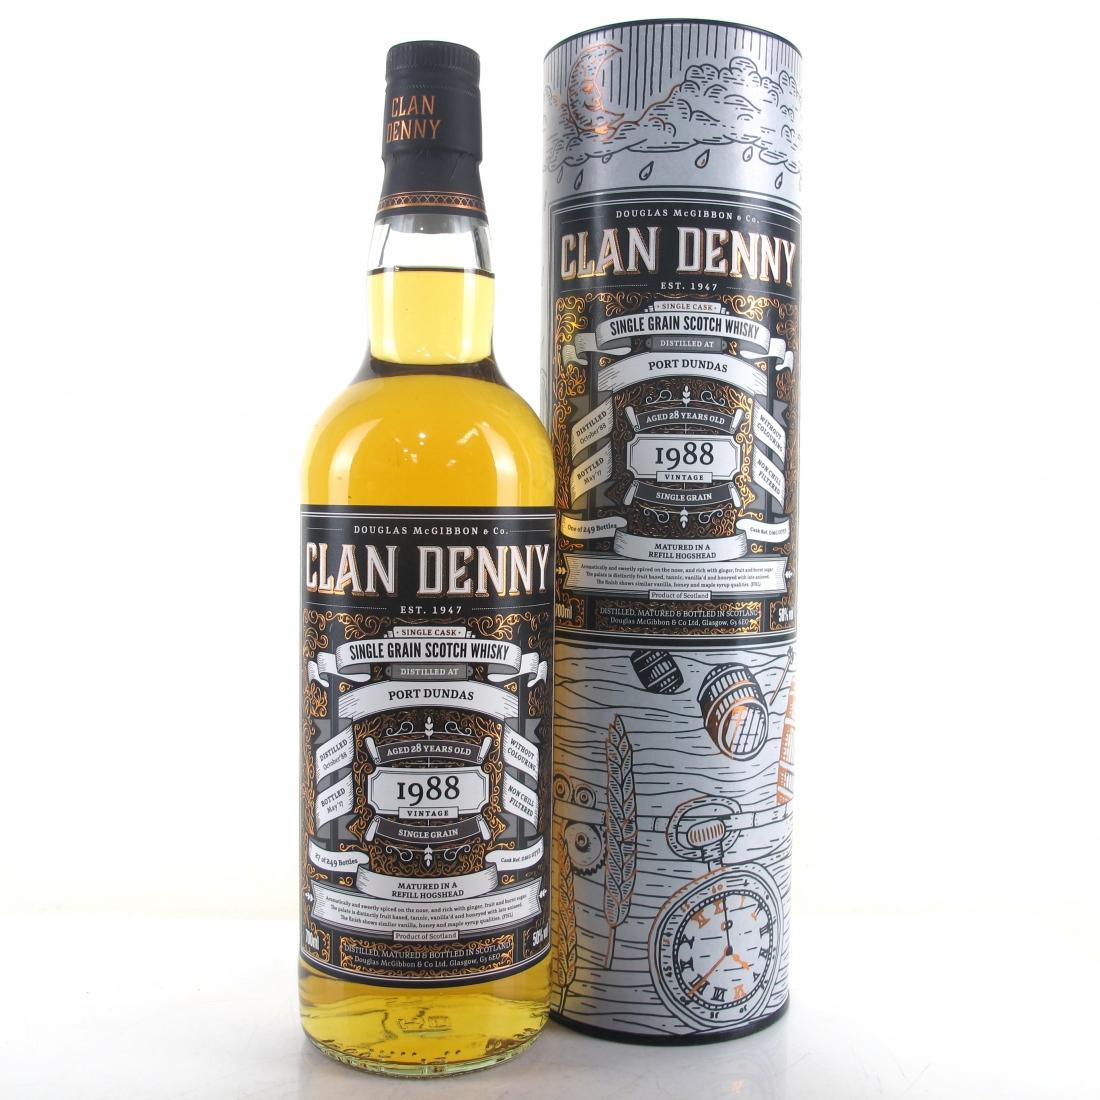 Port Dundas 1988 Clan Denny 28 Year Old